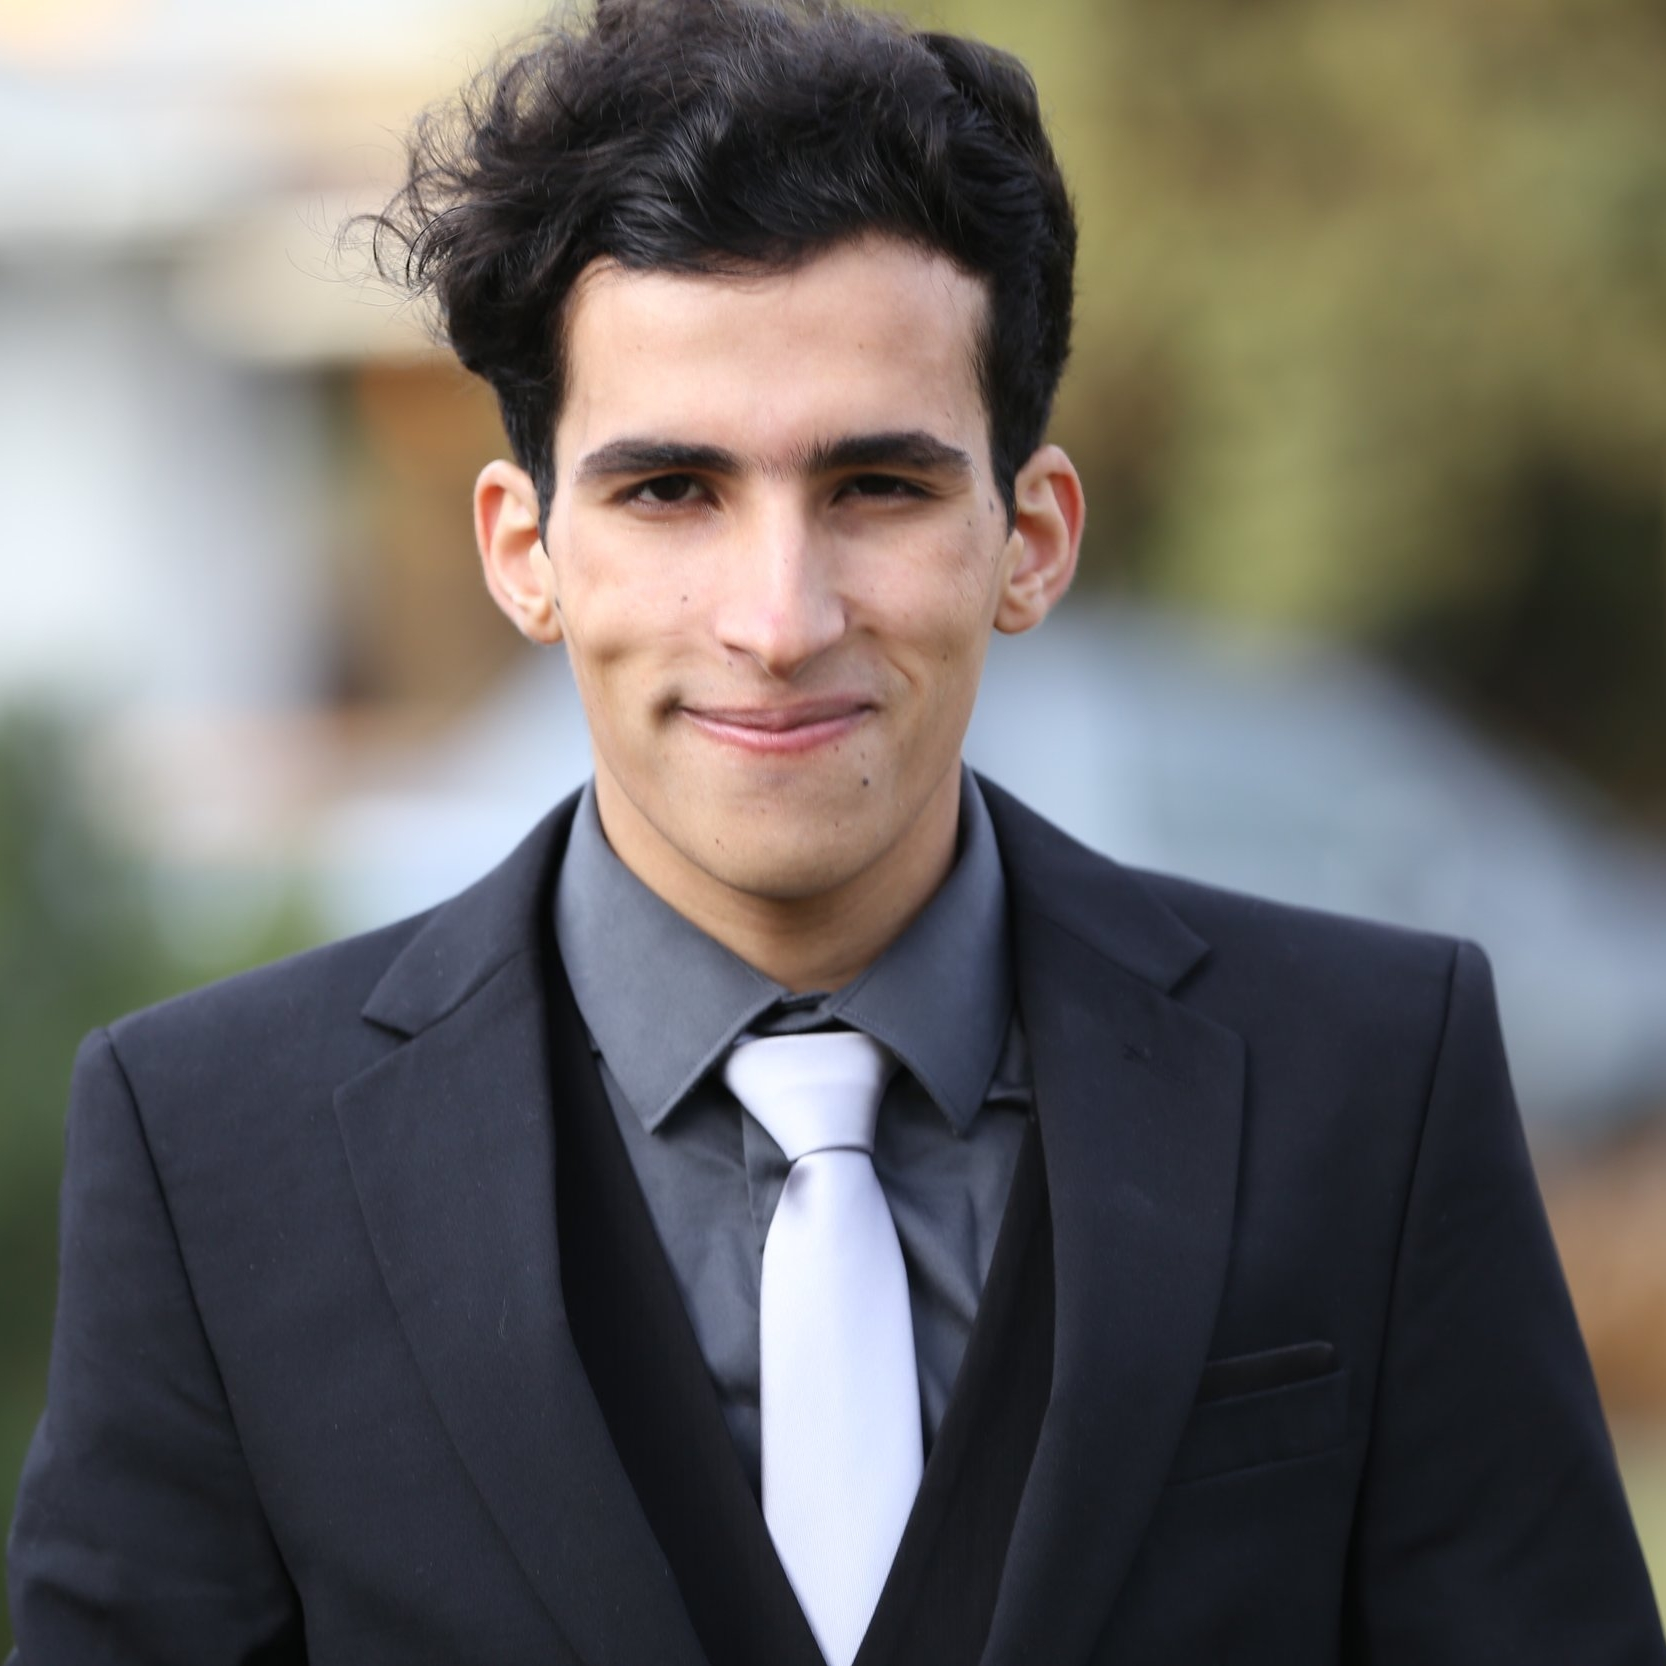 HANI AL MOULIA - Acclaimed Photographer and Social Justice Advocate